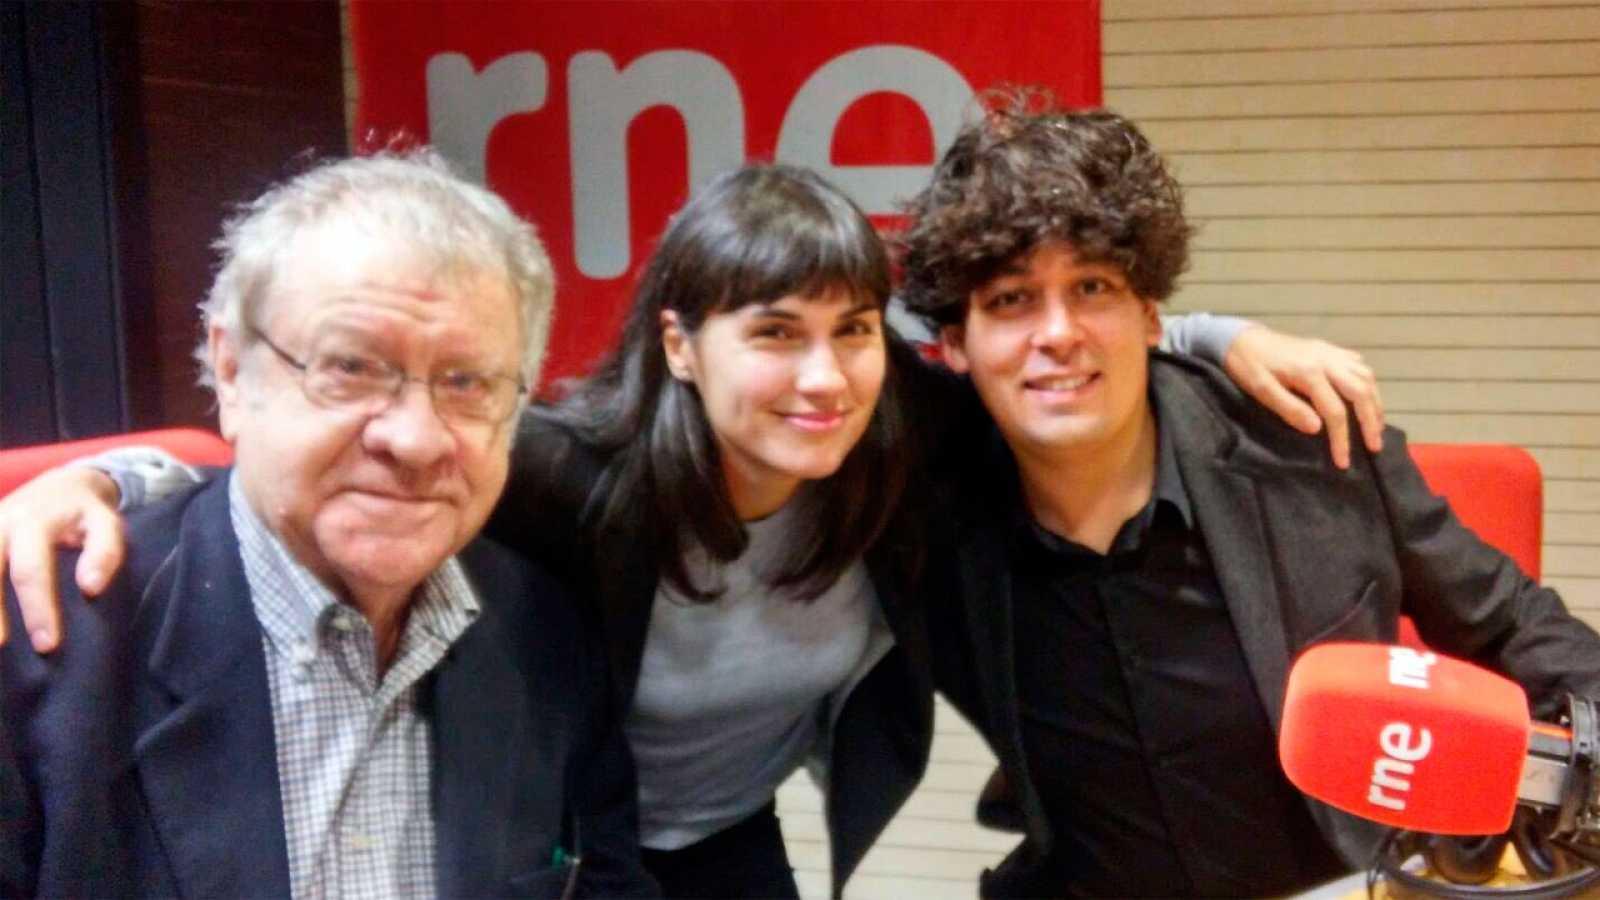 Hoy empieza todo con Marta Echeverría - Barriupedia - Lorca en Galicia - 27/10/16 - Escuchar ahora